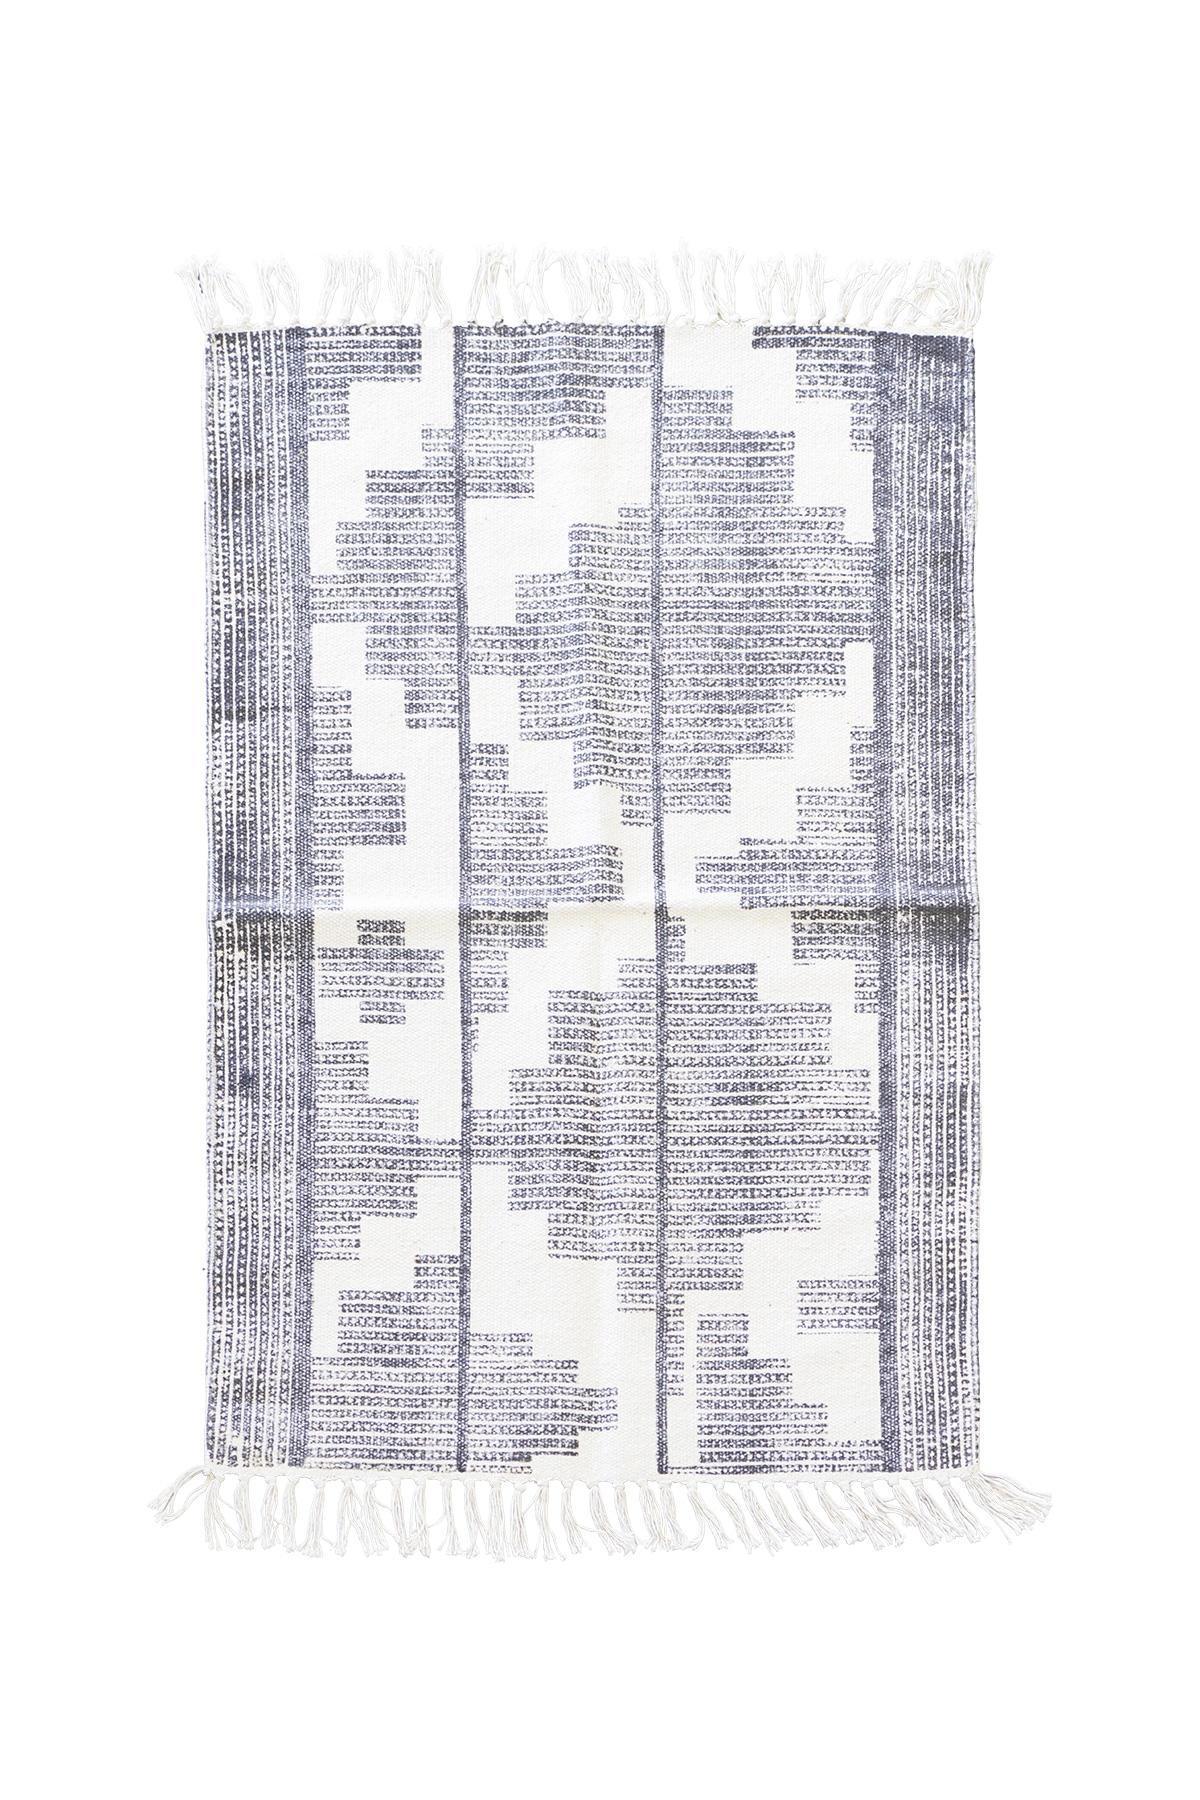 house doctor Koberec Eve 160x230 cm, šedá barva, bílá barva, textil Bílá